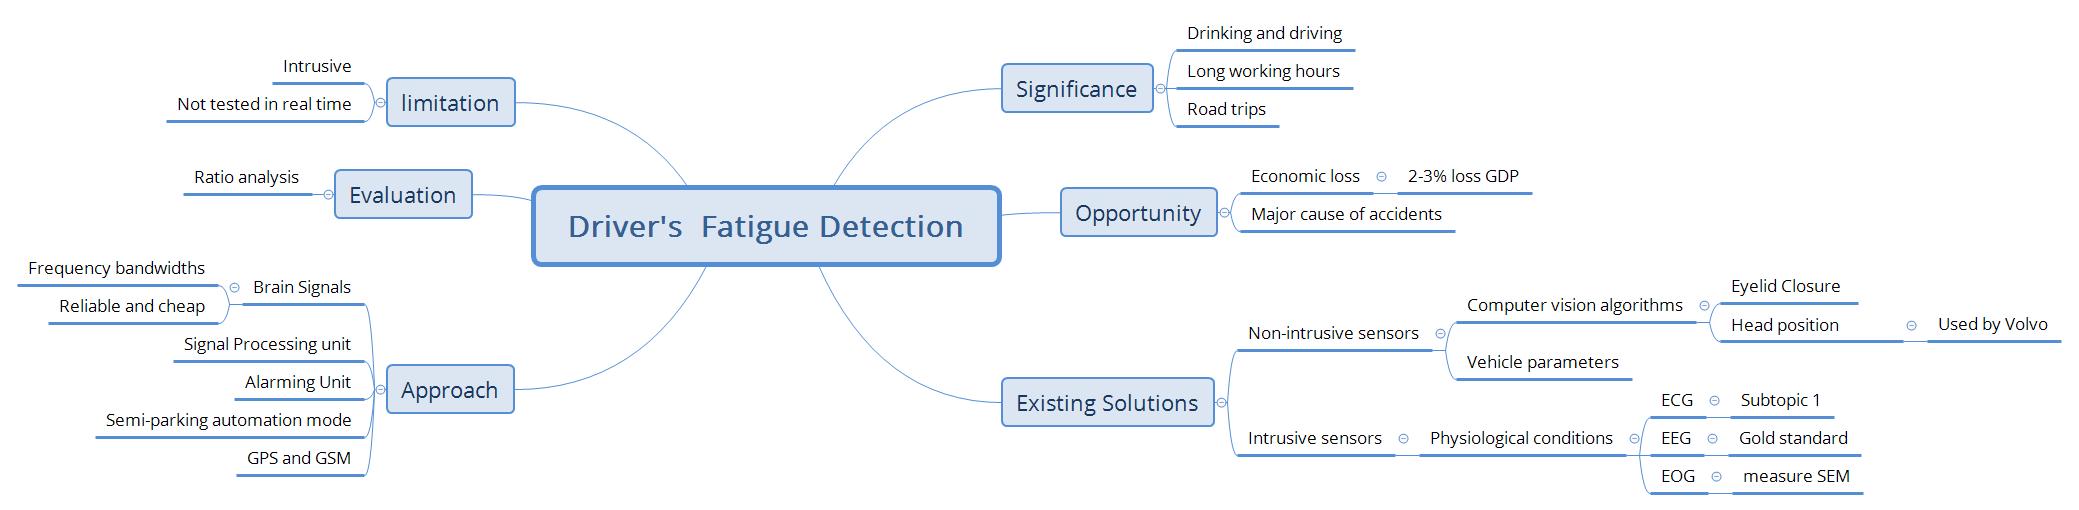 significance limitation of ratio analysis